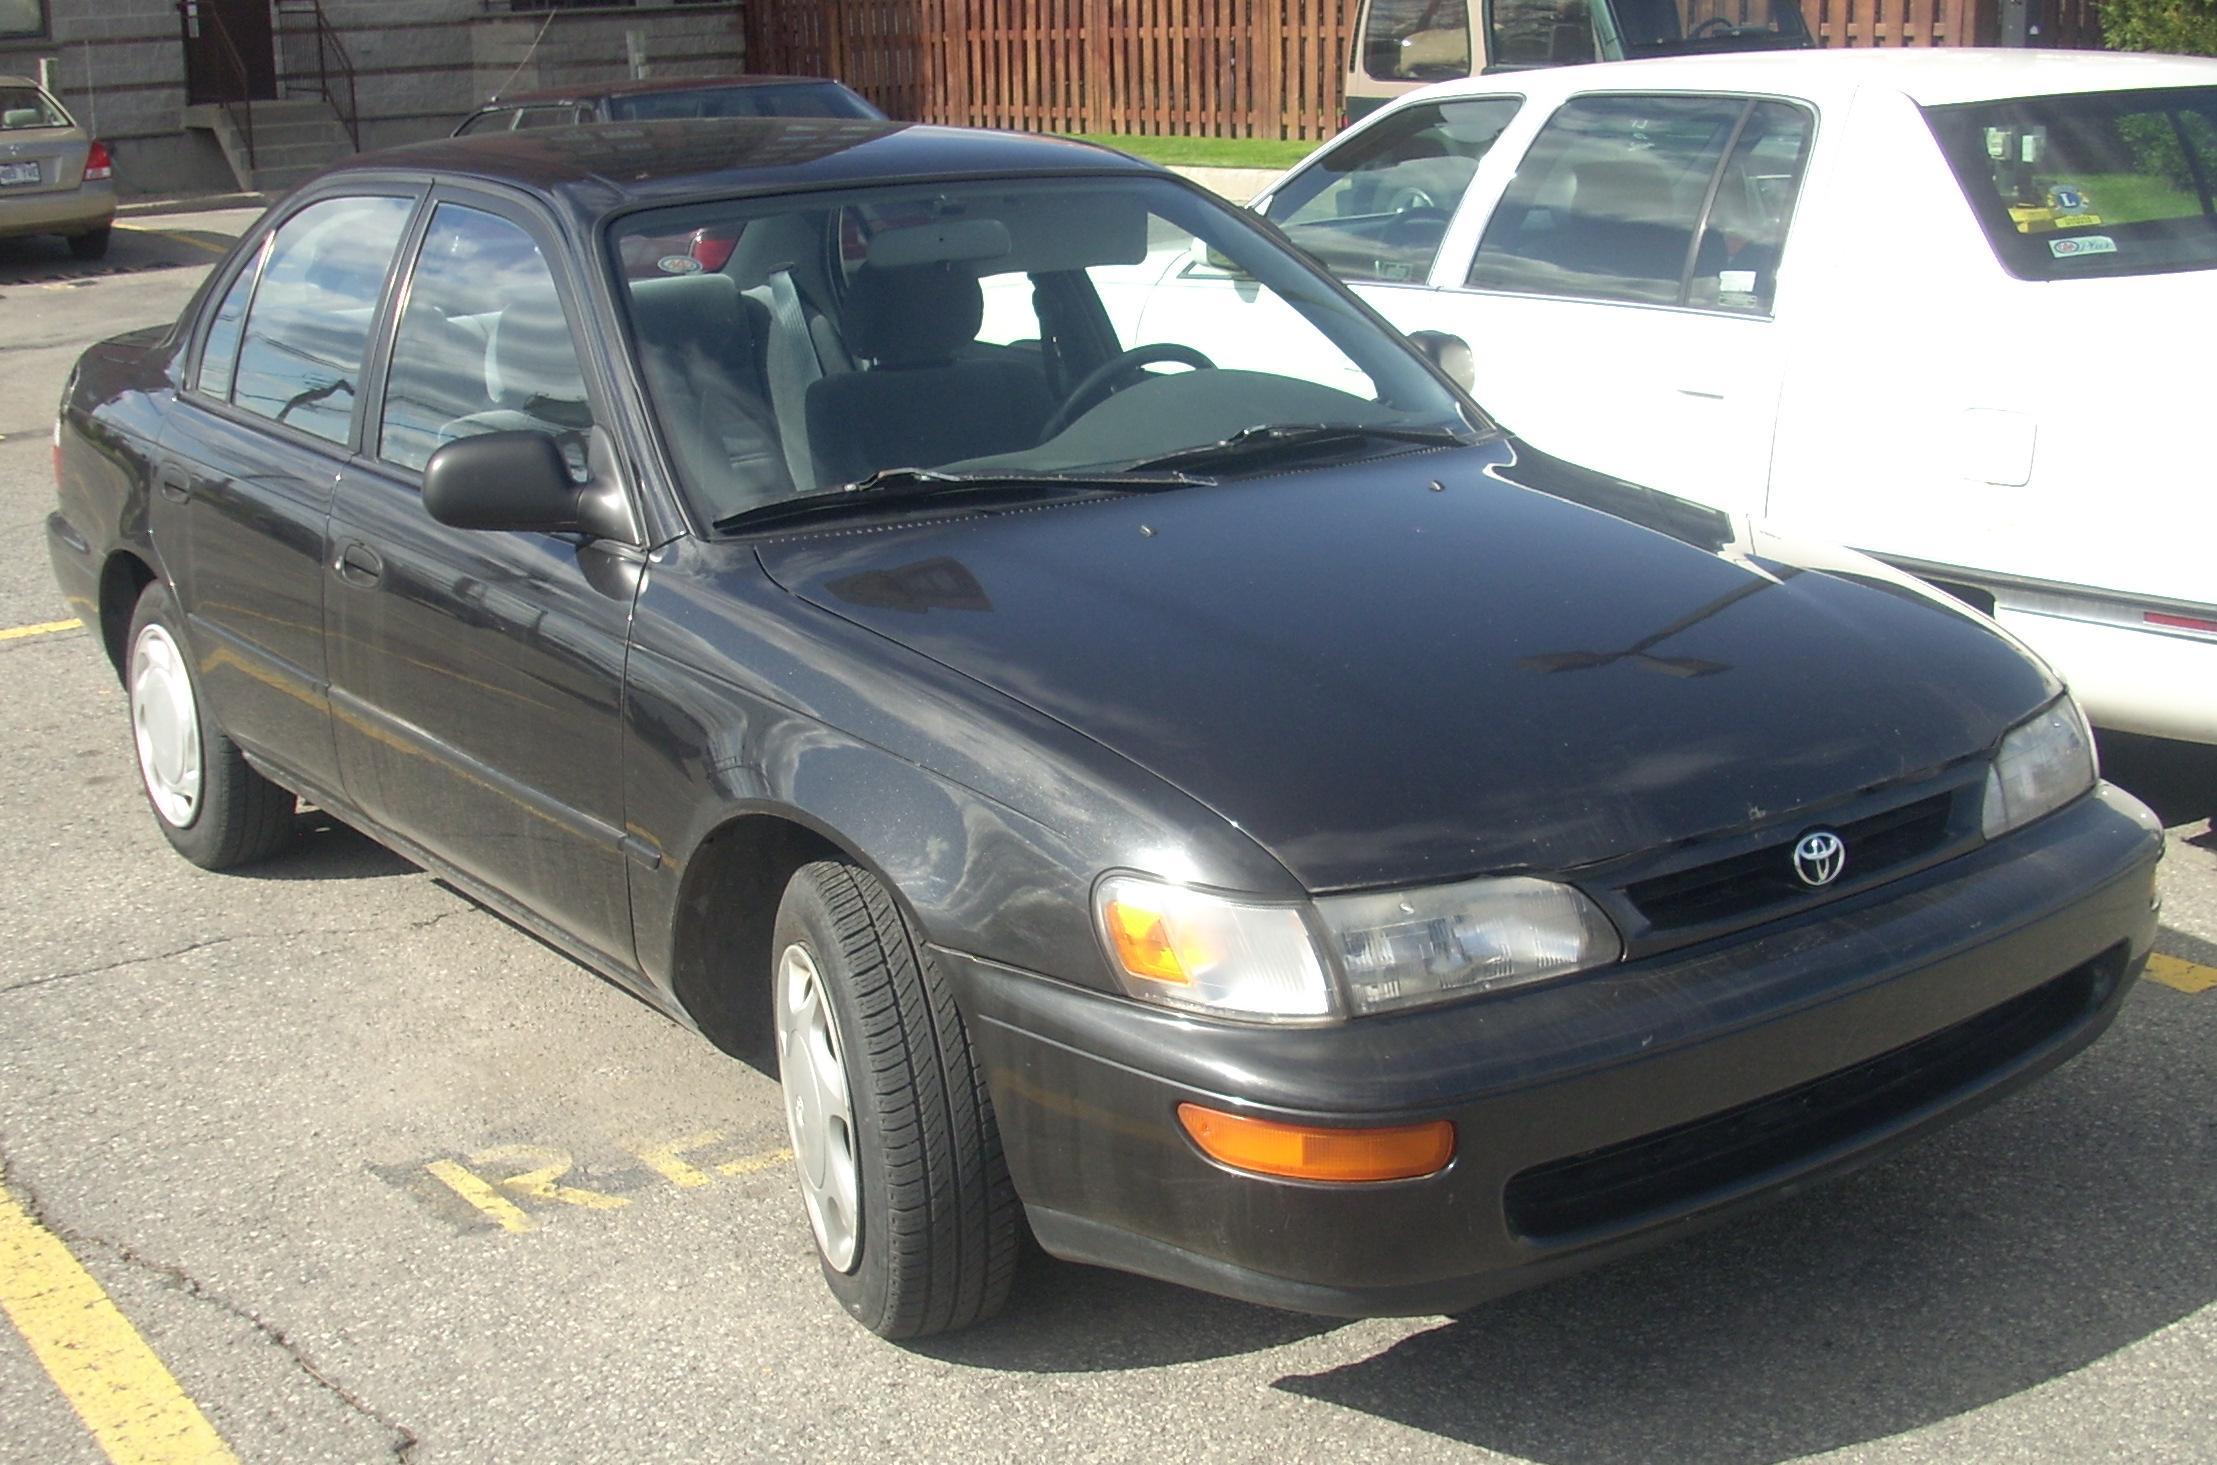 File:'96-'97 Toyota Corolla Sedan.JPG - Wikimedia Commons